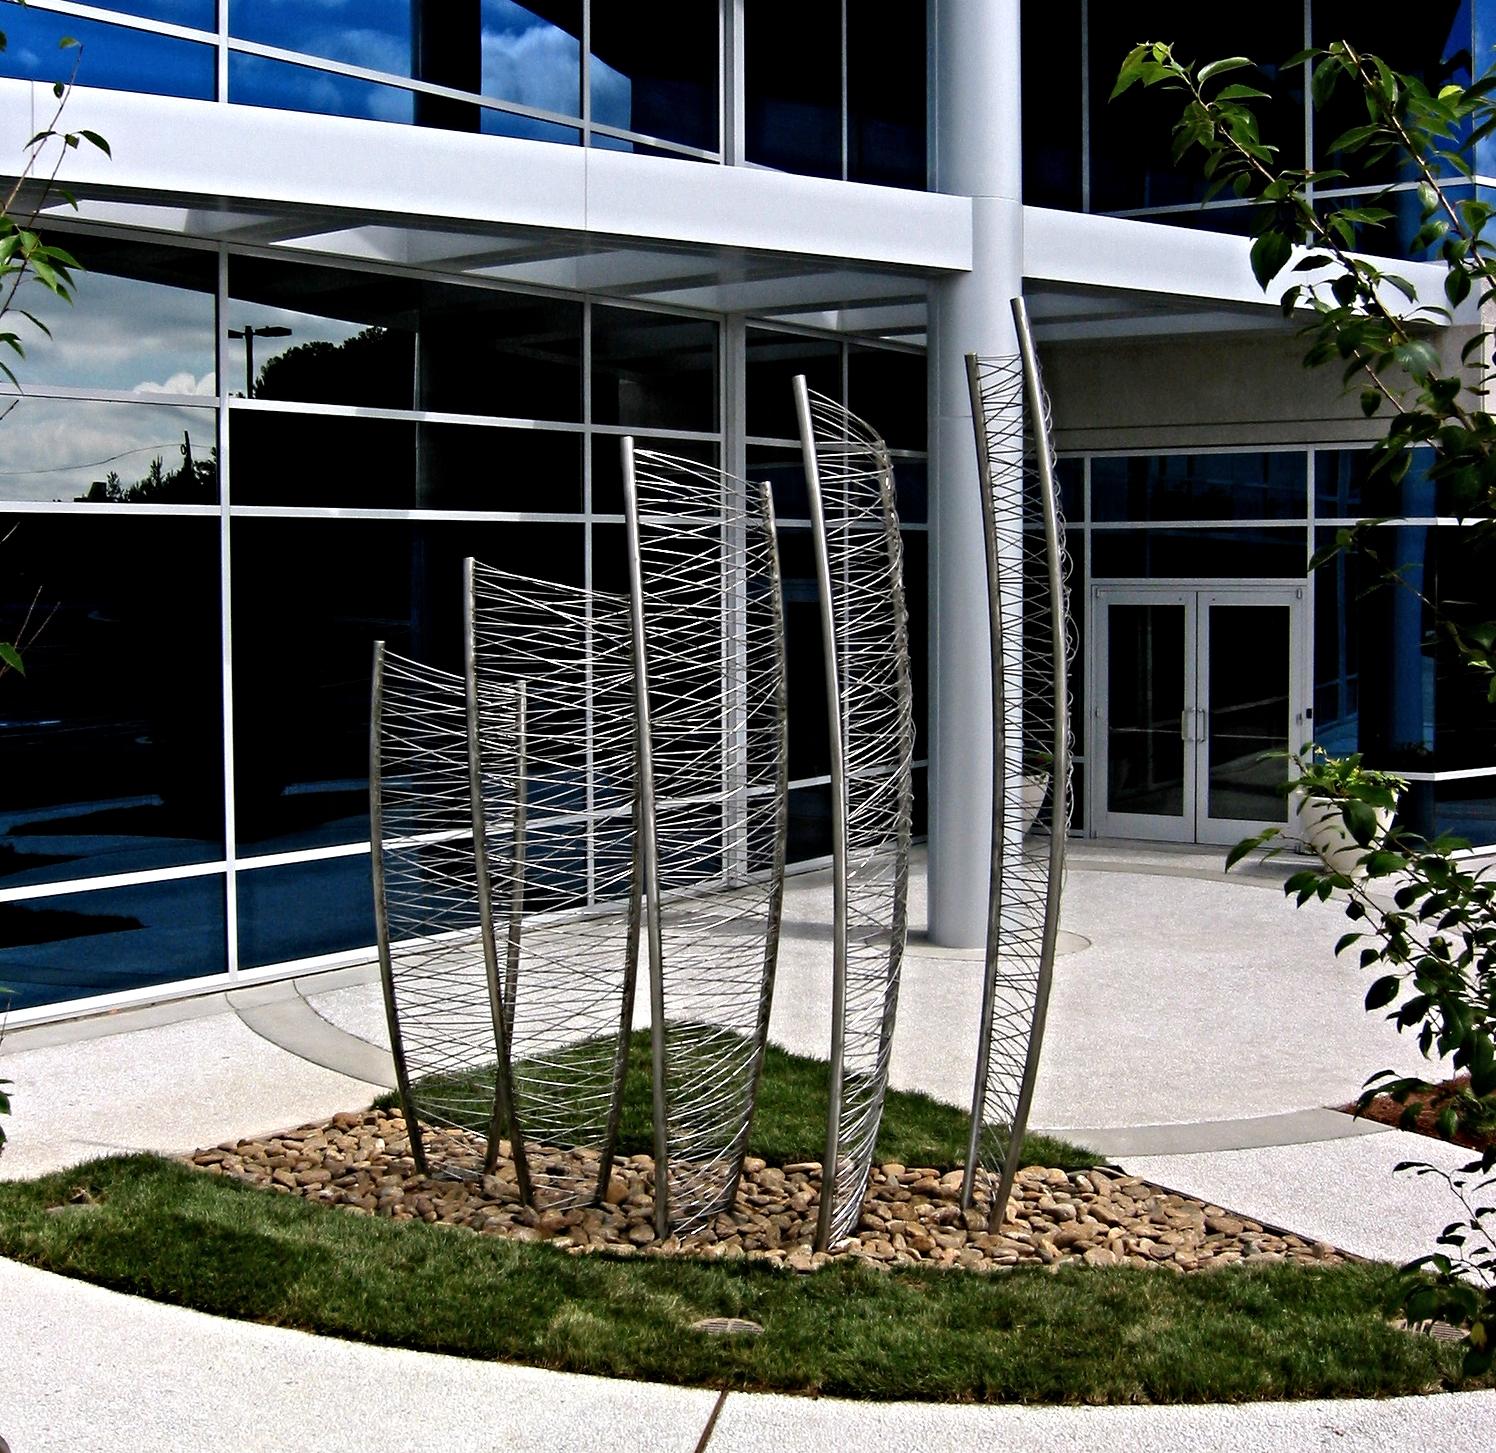 DanburySculpture-03.JPG